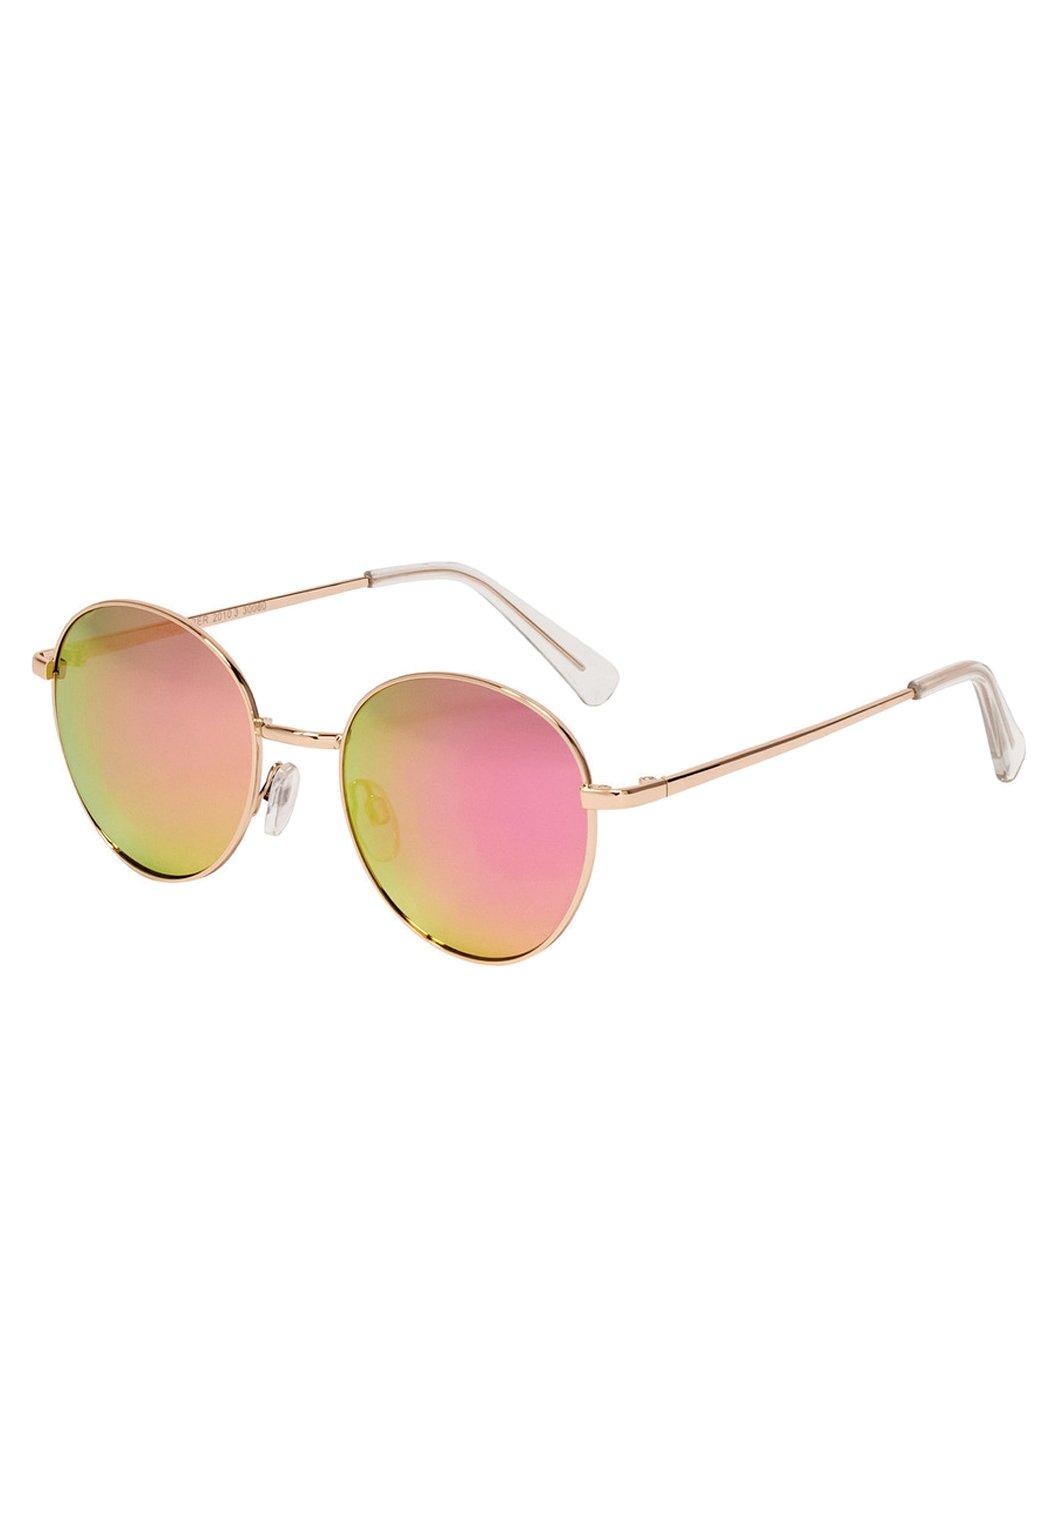 HALLHUBER MIT METALLGESTELL - Sunglasses - gold